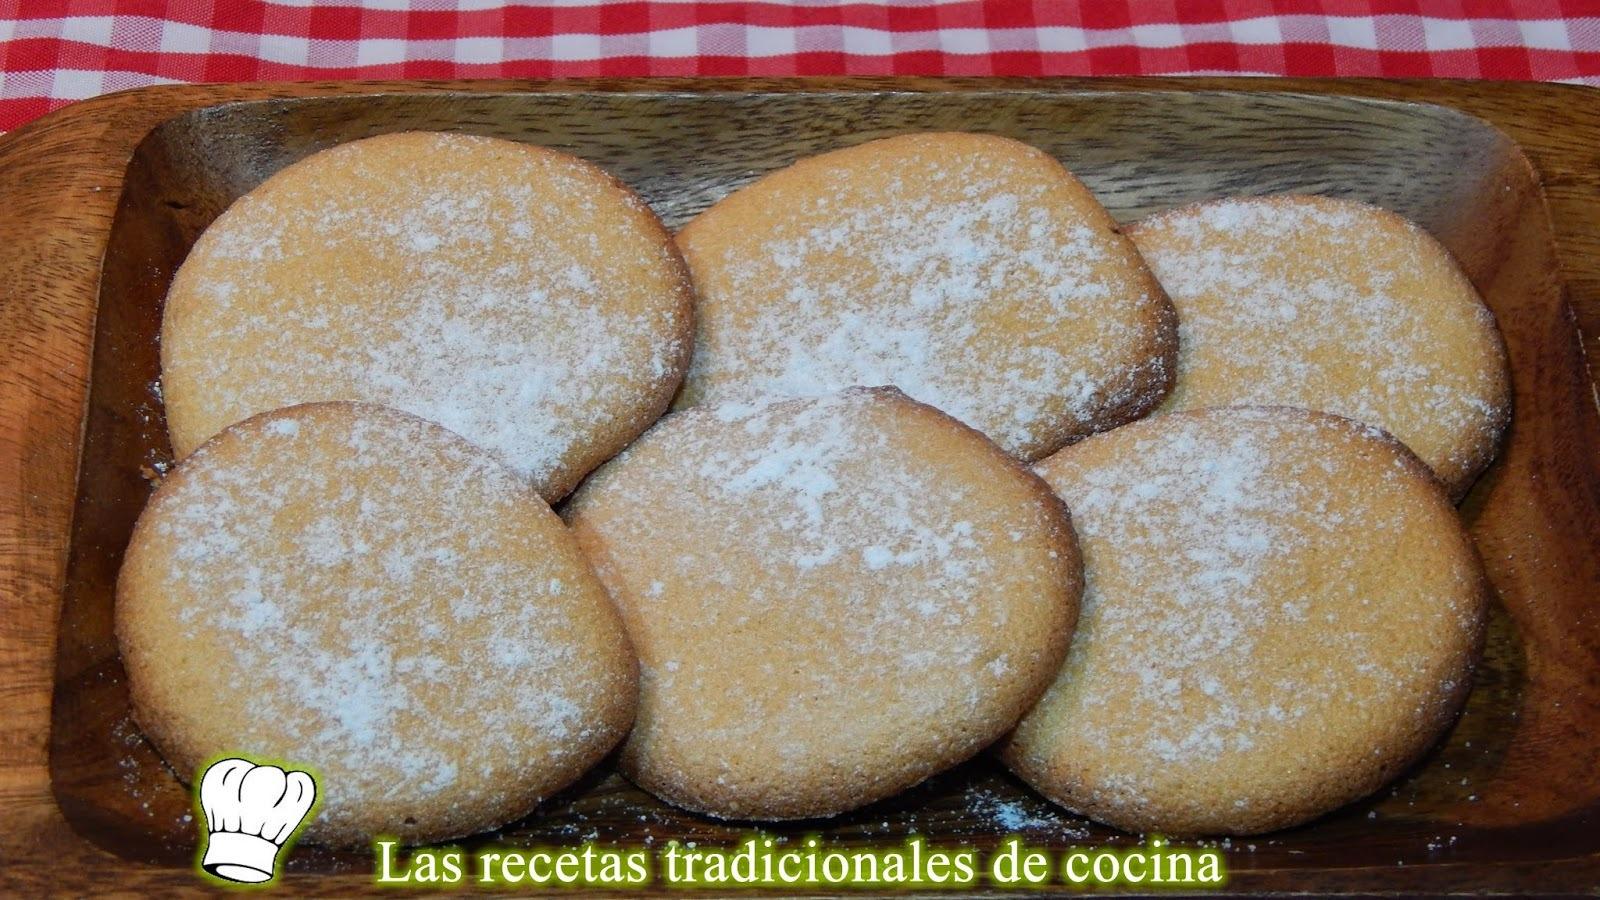 manteca vegetal para decorar tortas